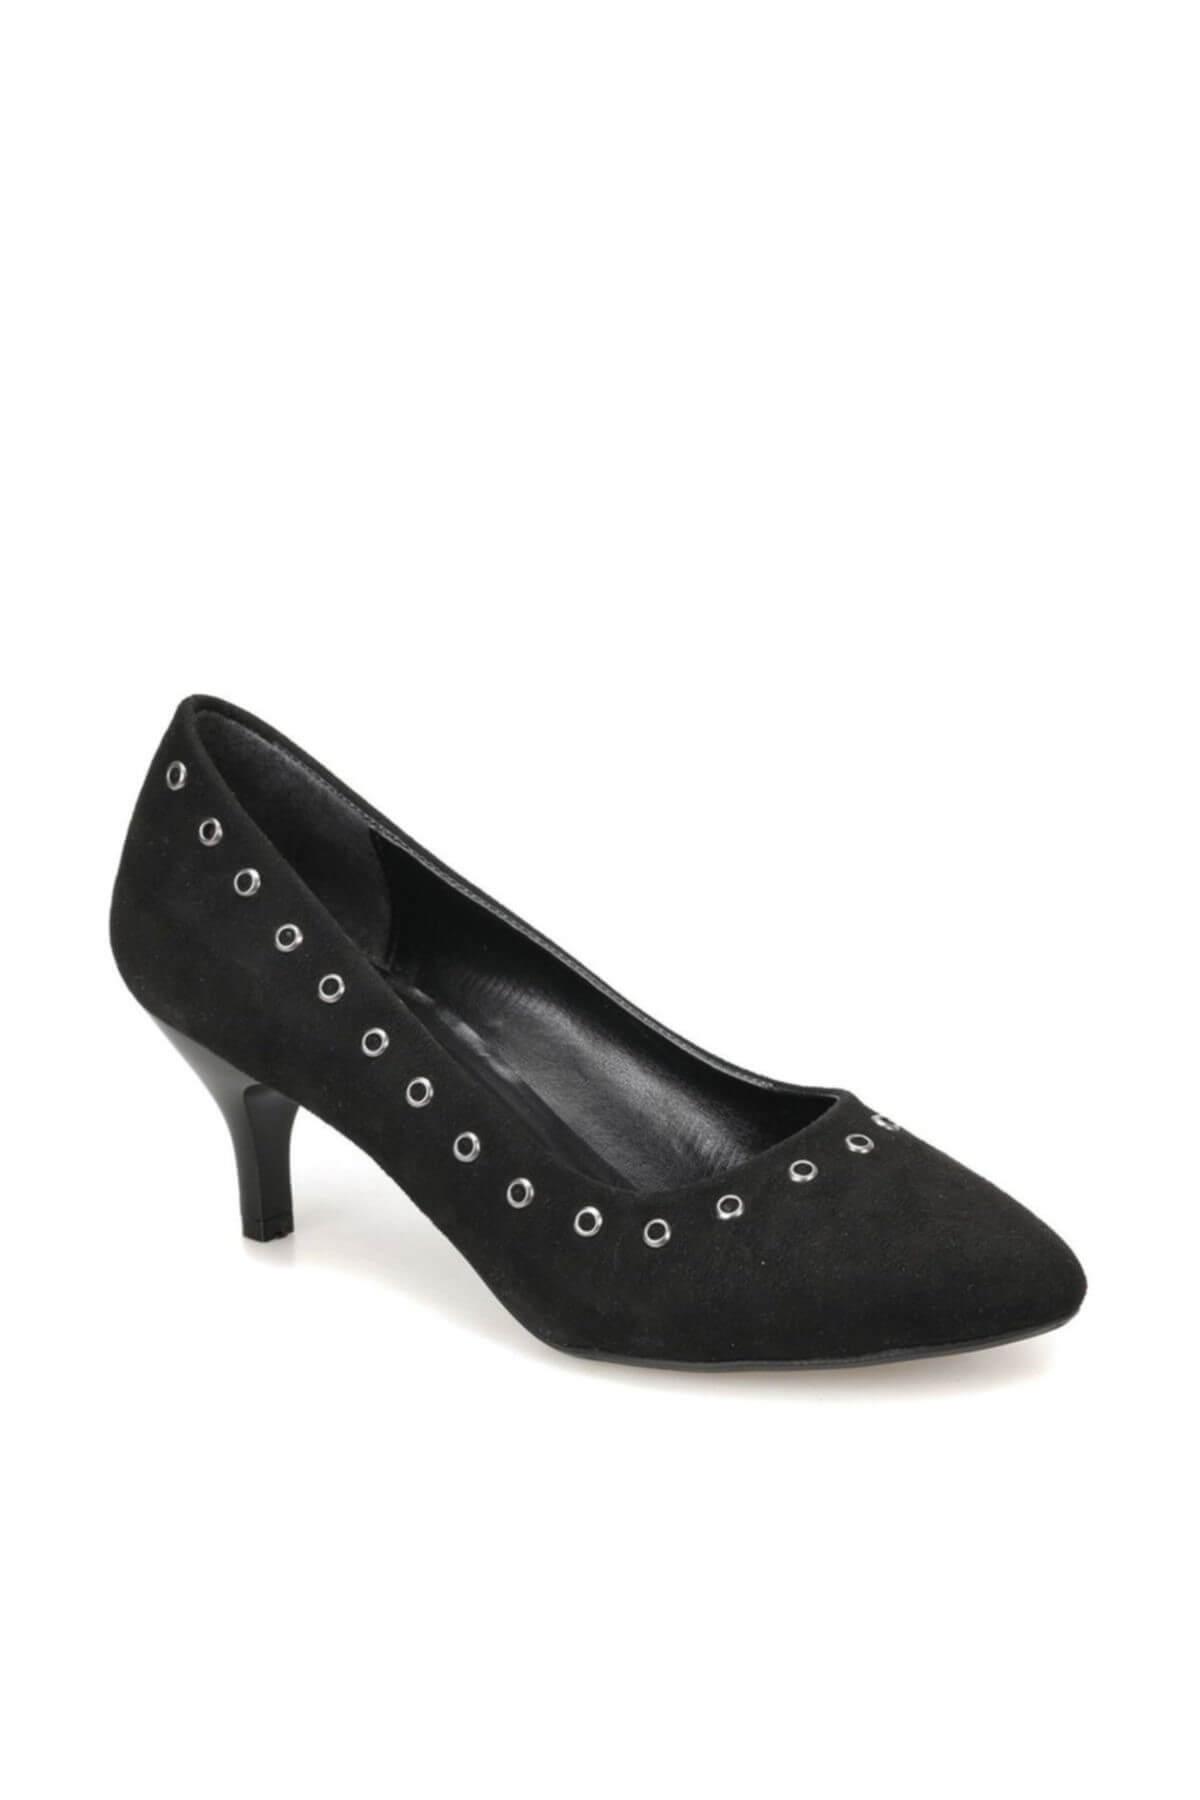 Miss F DW18038 Siyah Kadın Topuklu Ayakkabı 100340818 1